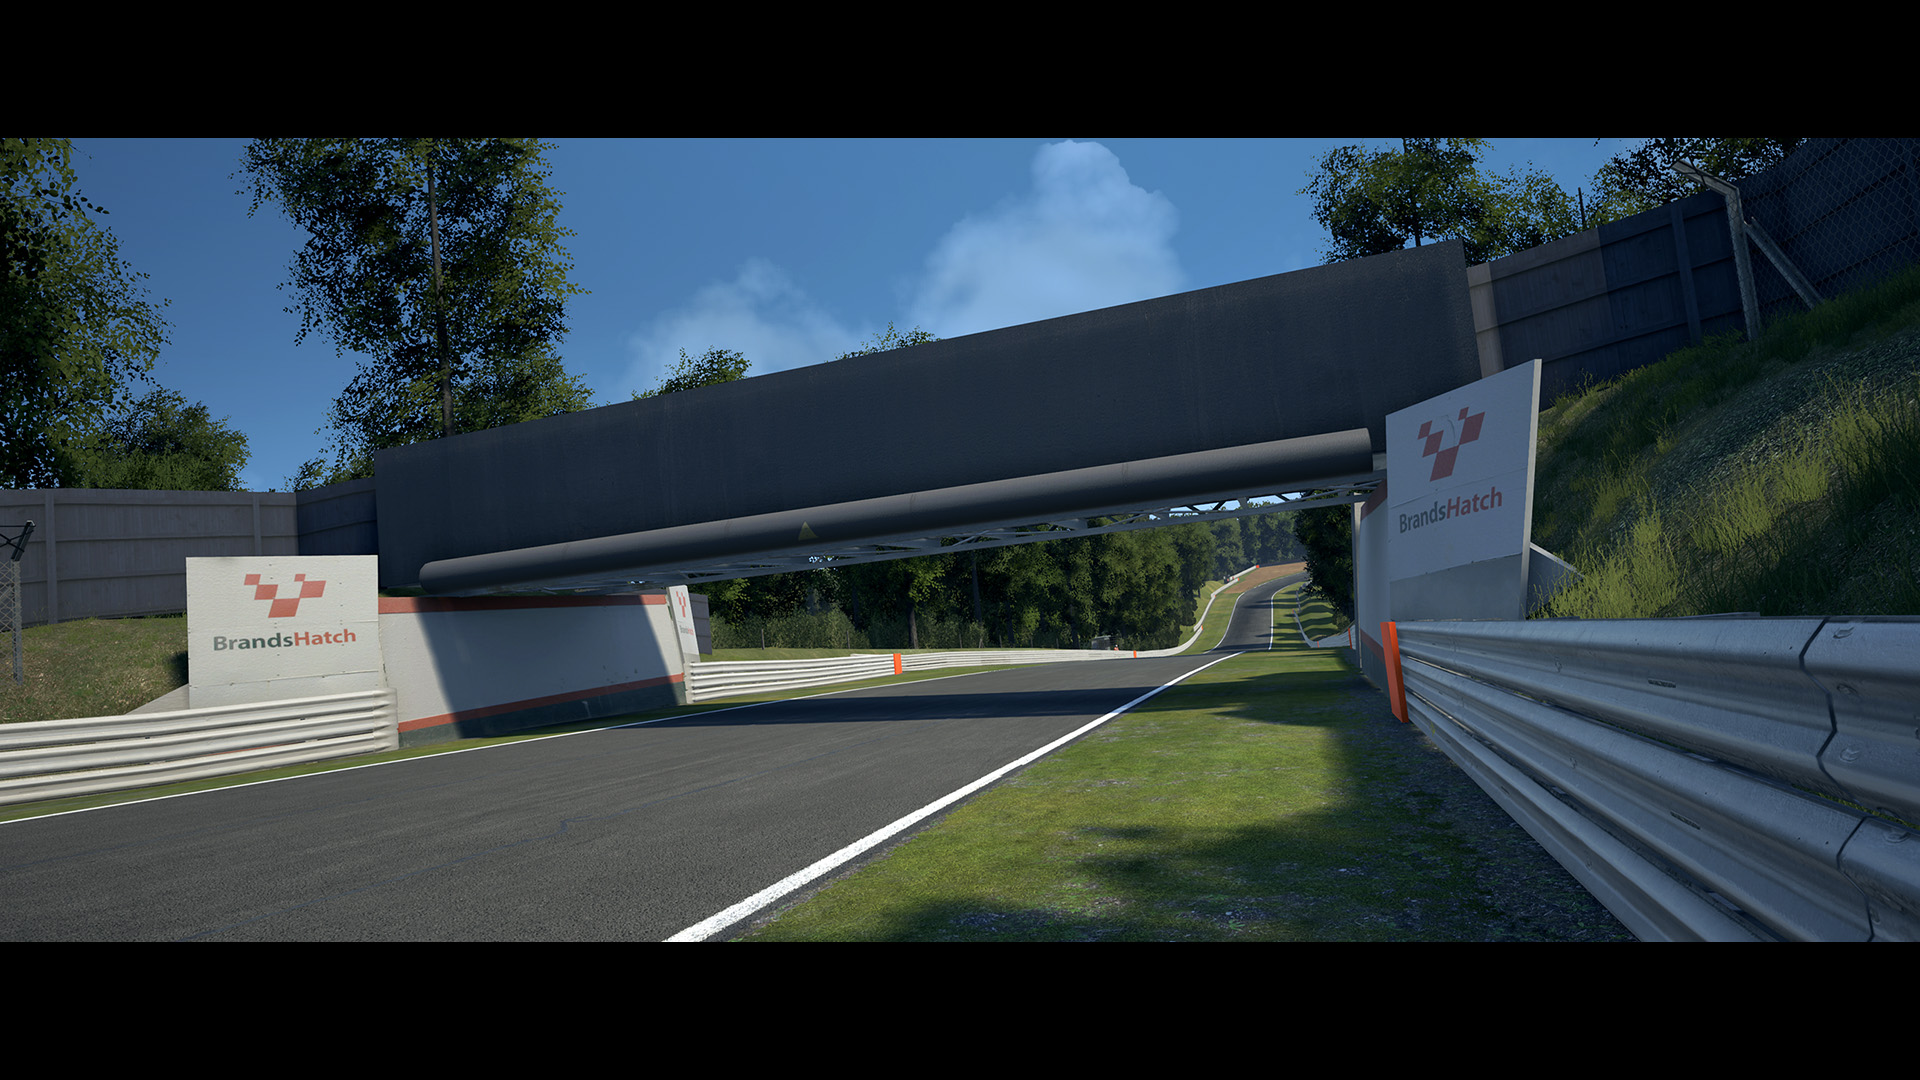 acc-racedepartment-com-5-jpg.239780